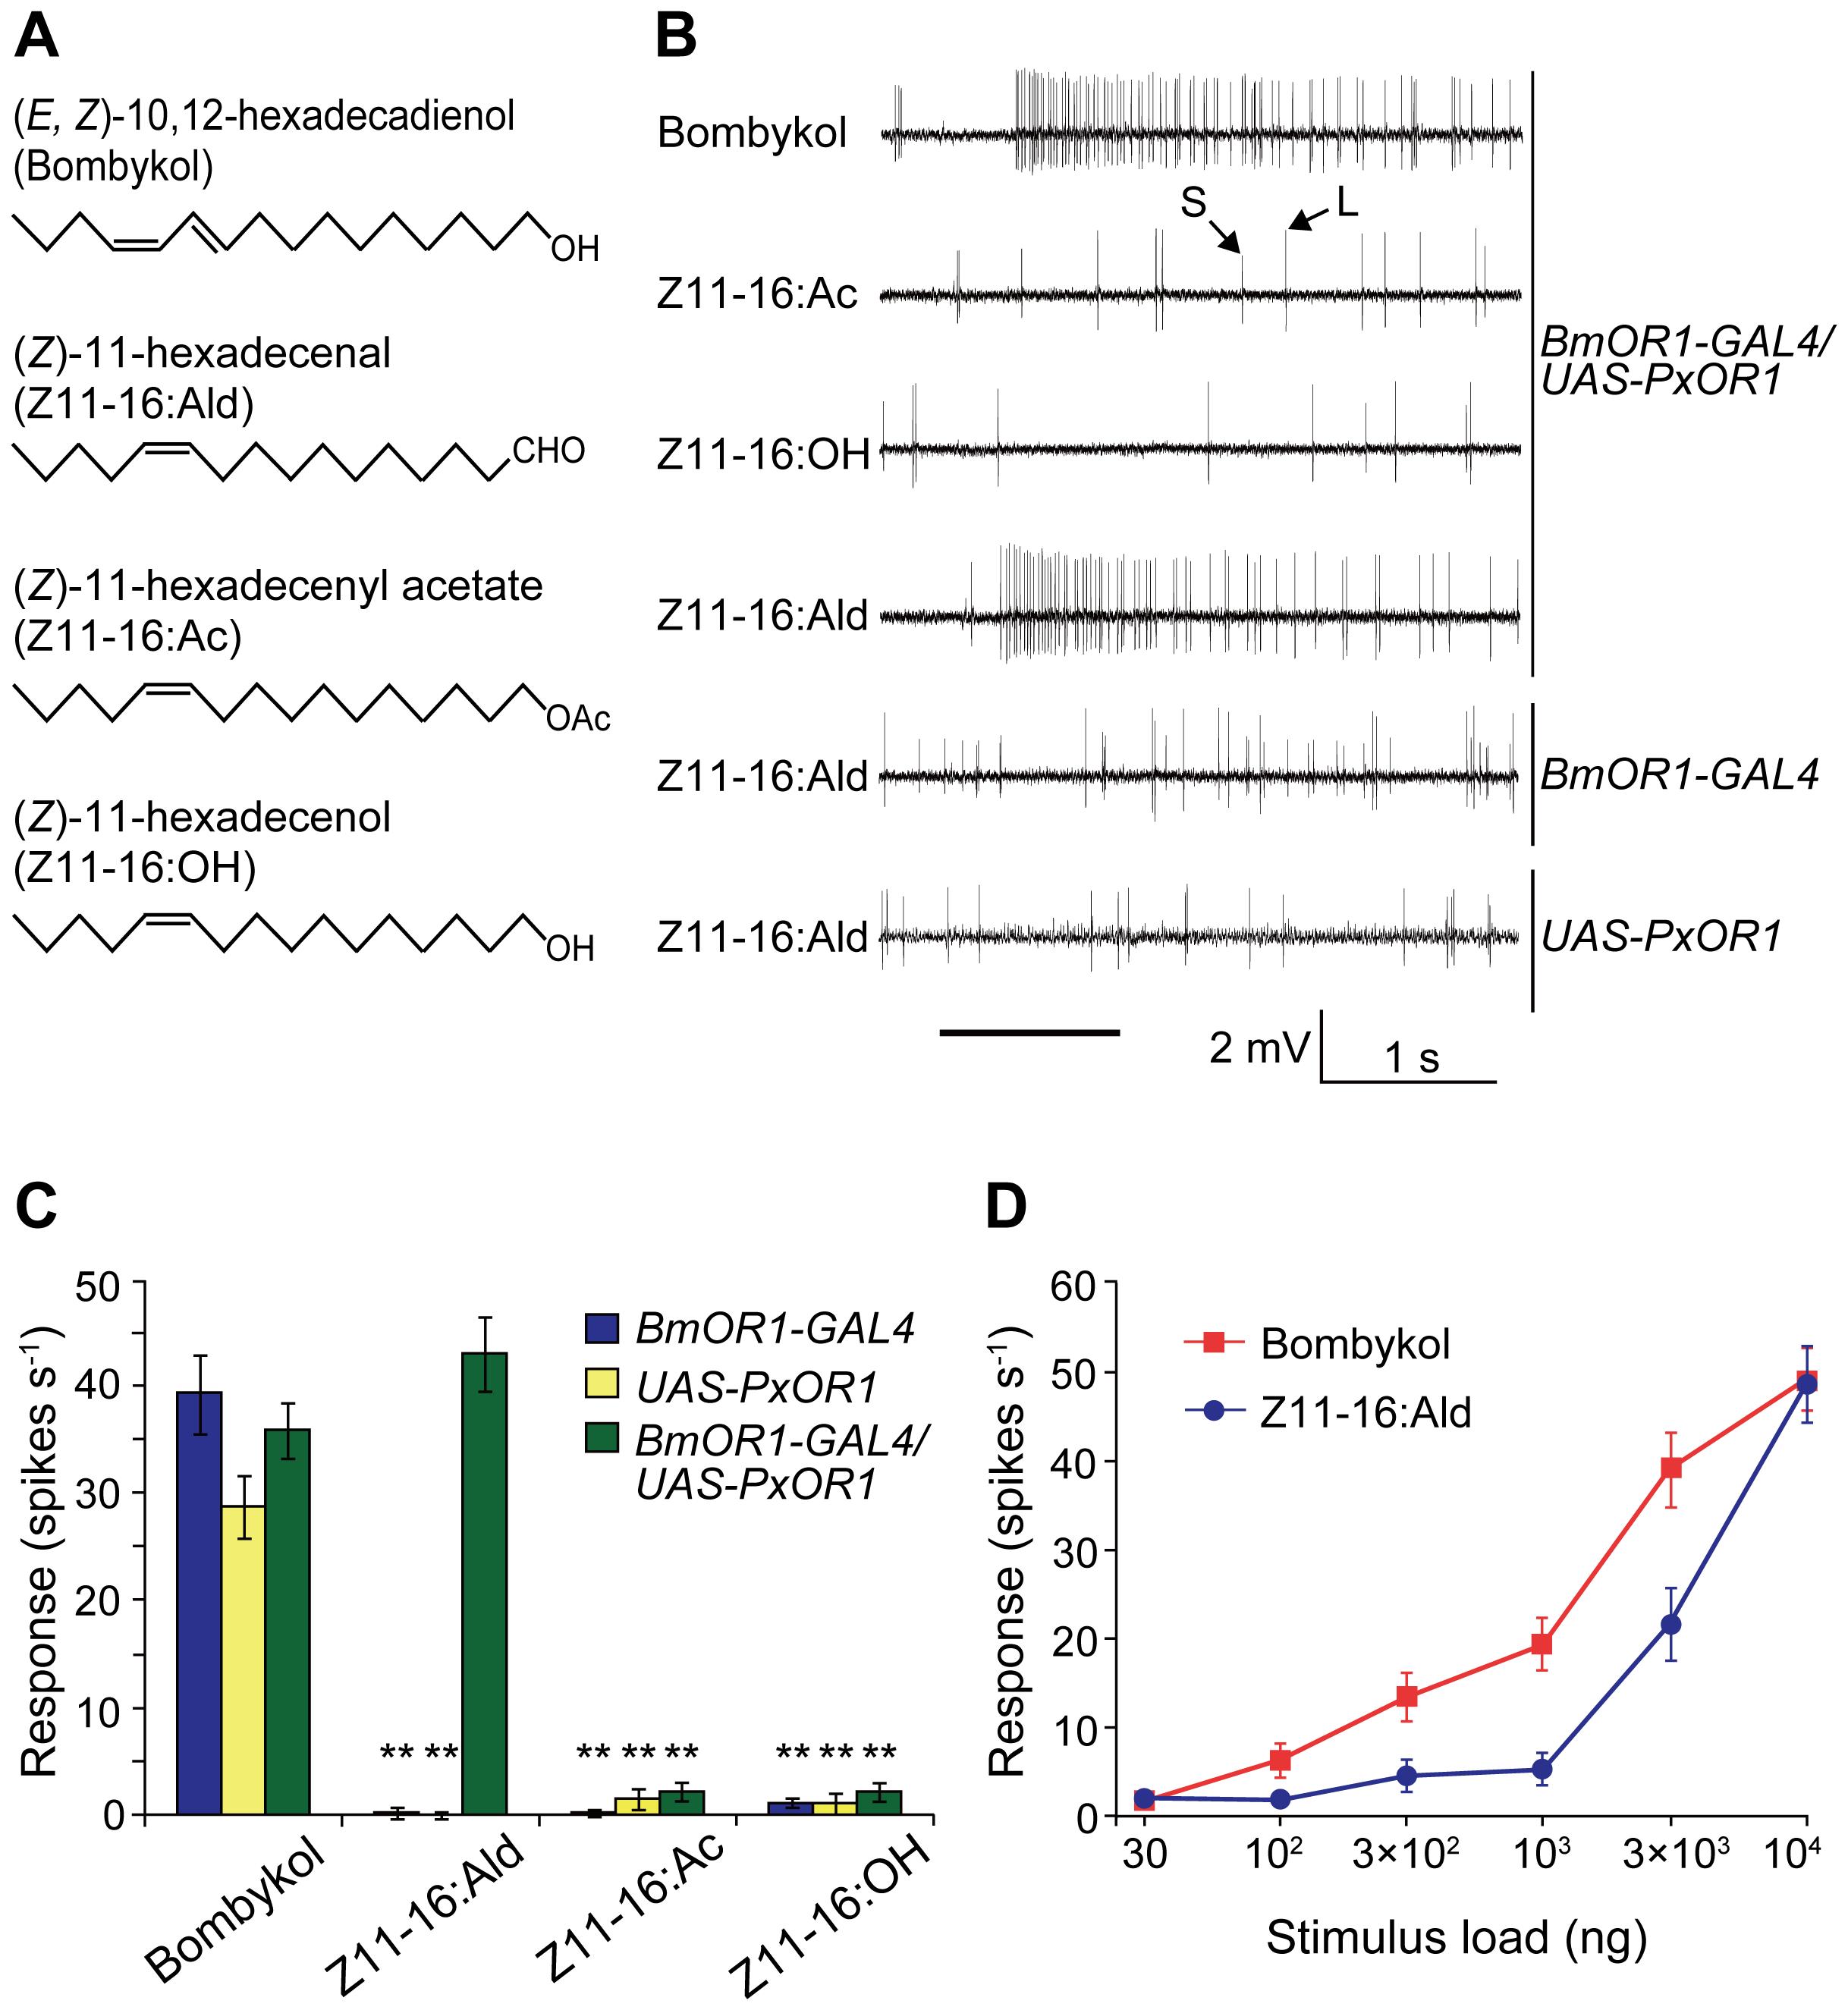 Single sensillum responses of PxOR1-expressing bombykol receptor neurons to Z11-16:Ald.